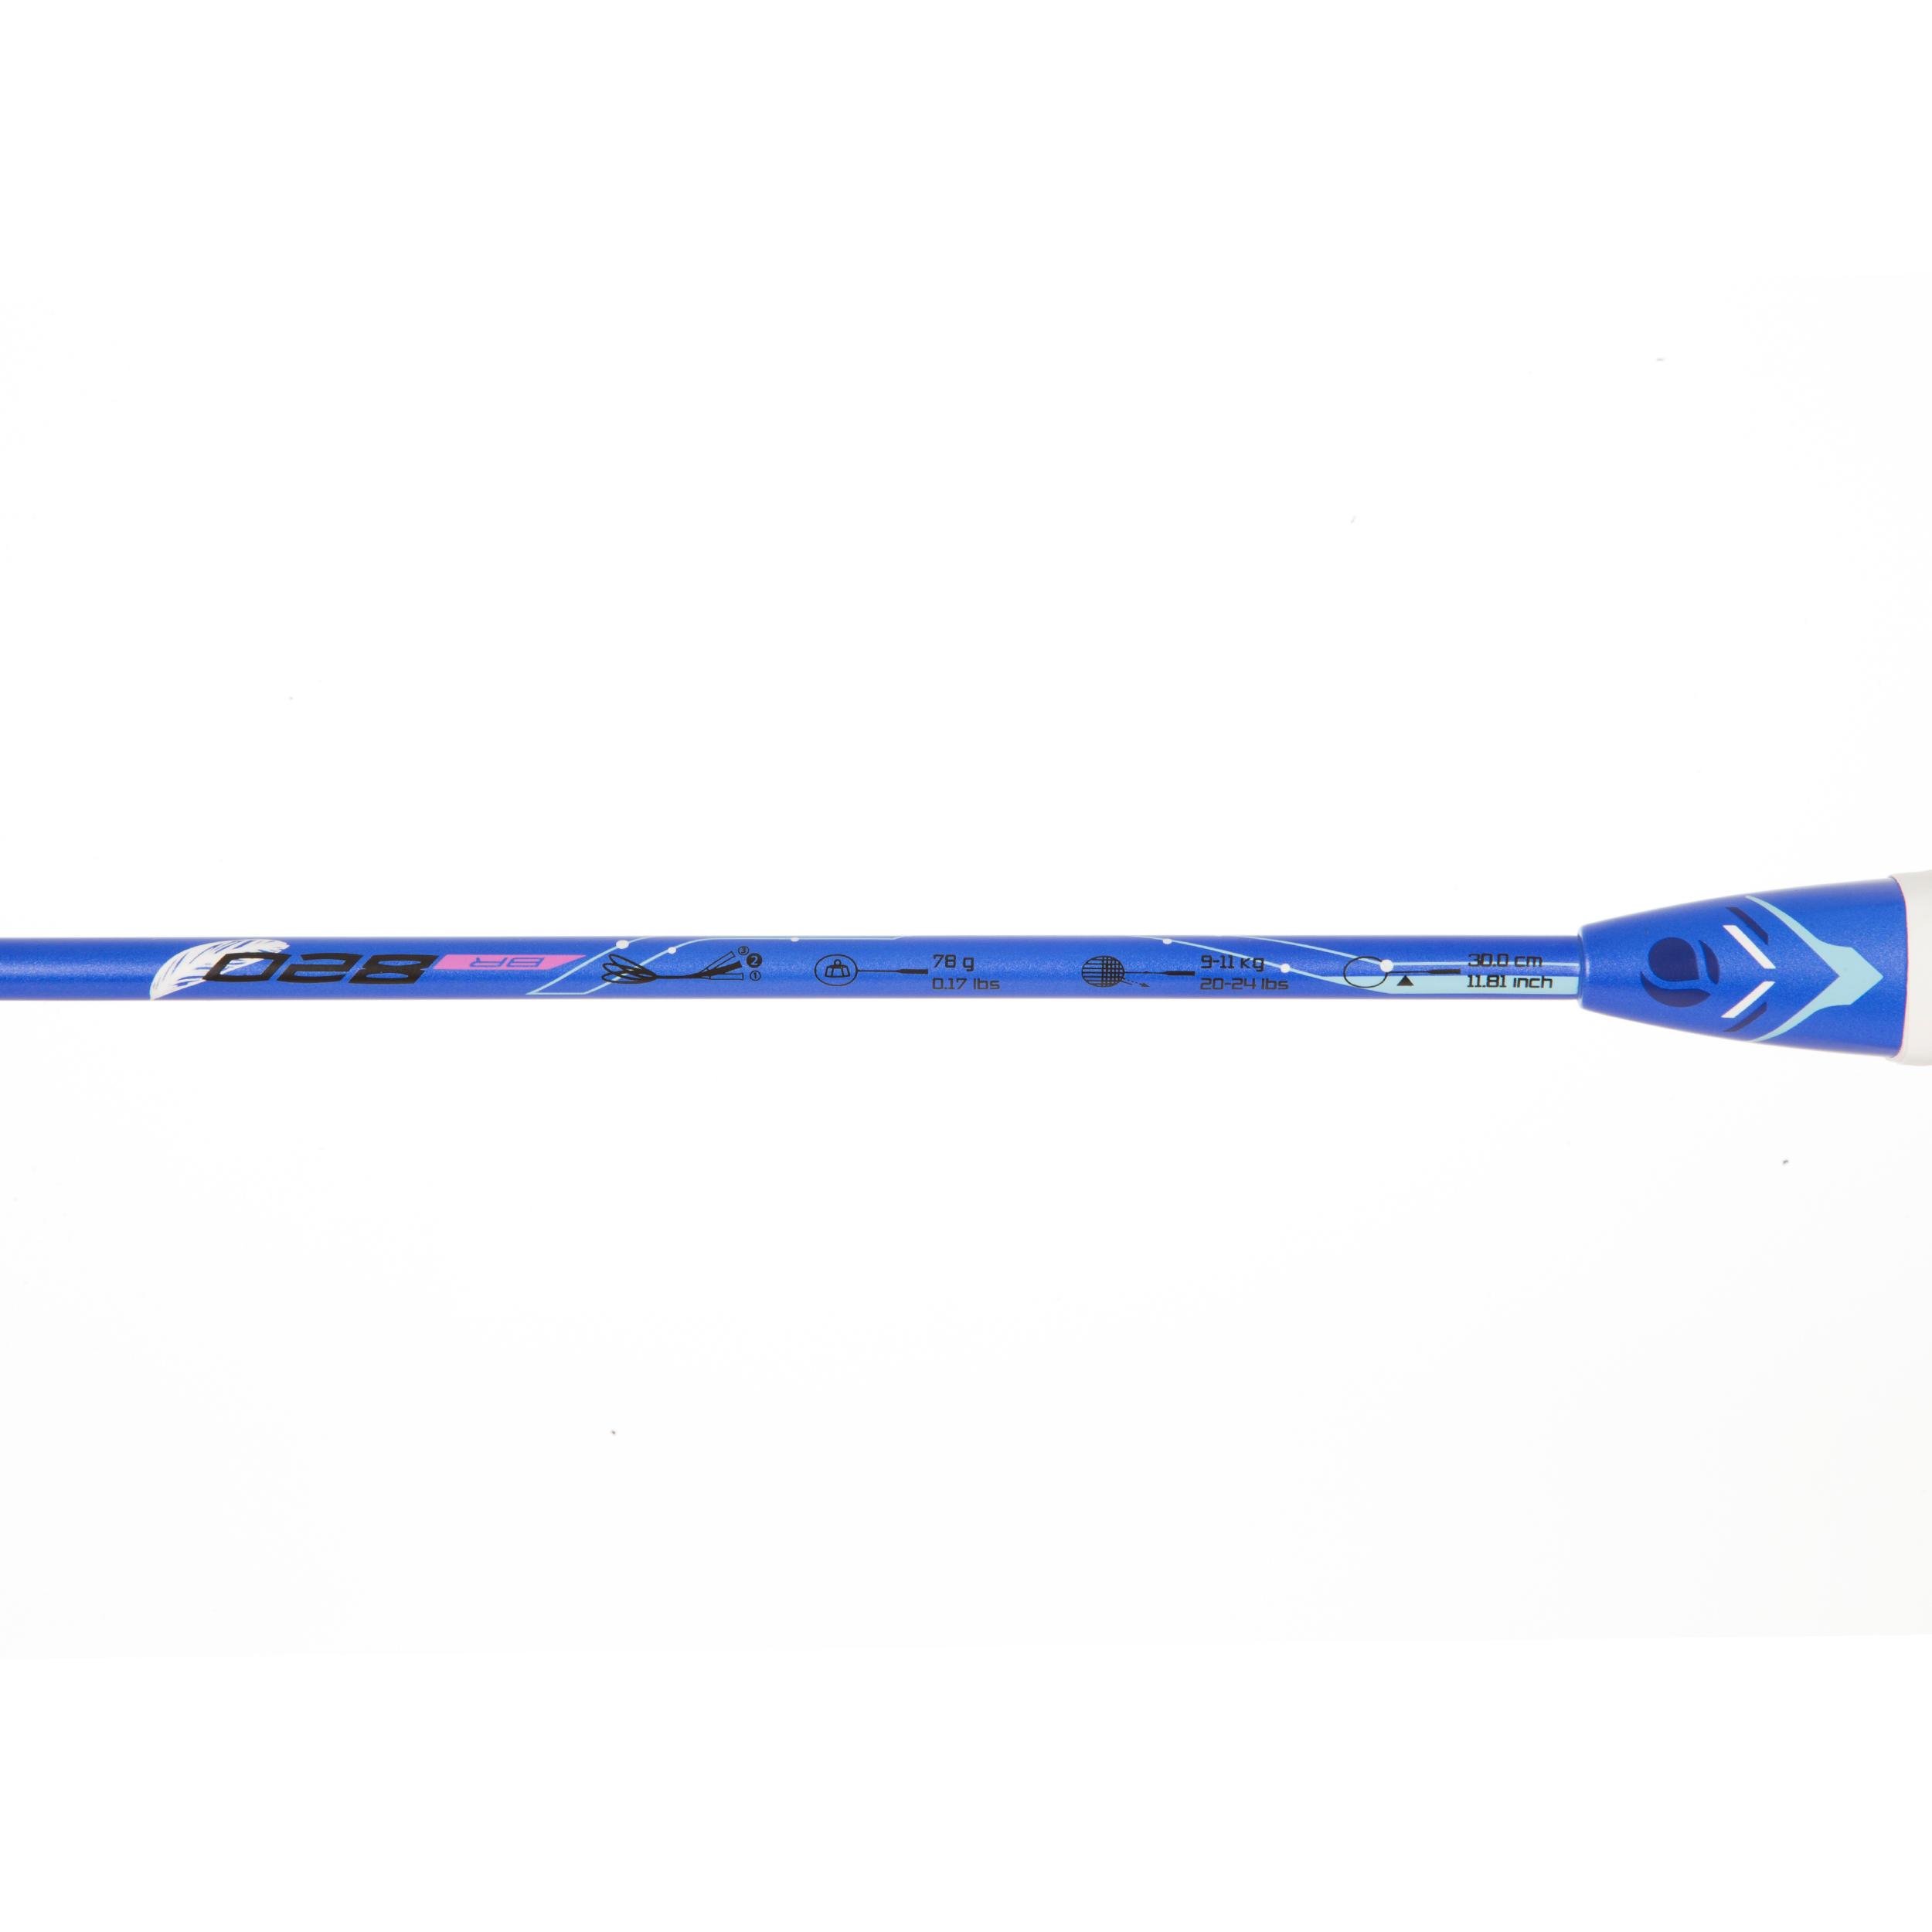 BR820 Adult Badminton Racket - Blue